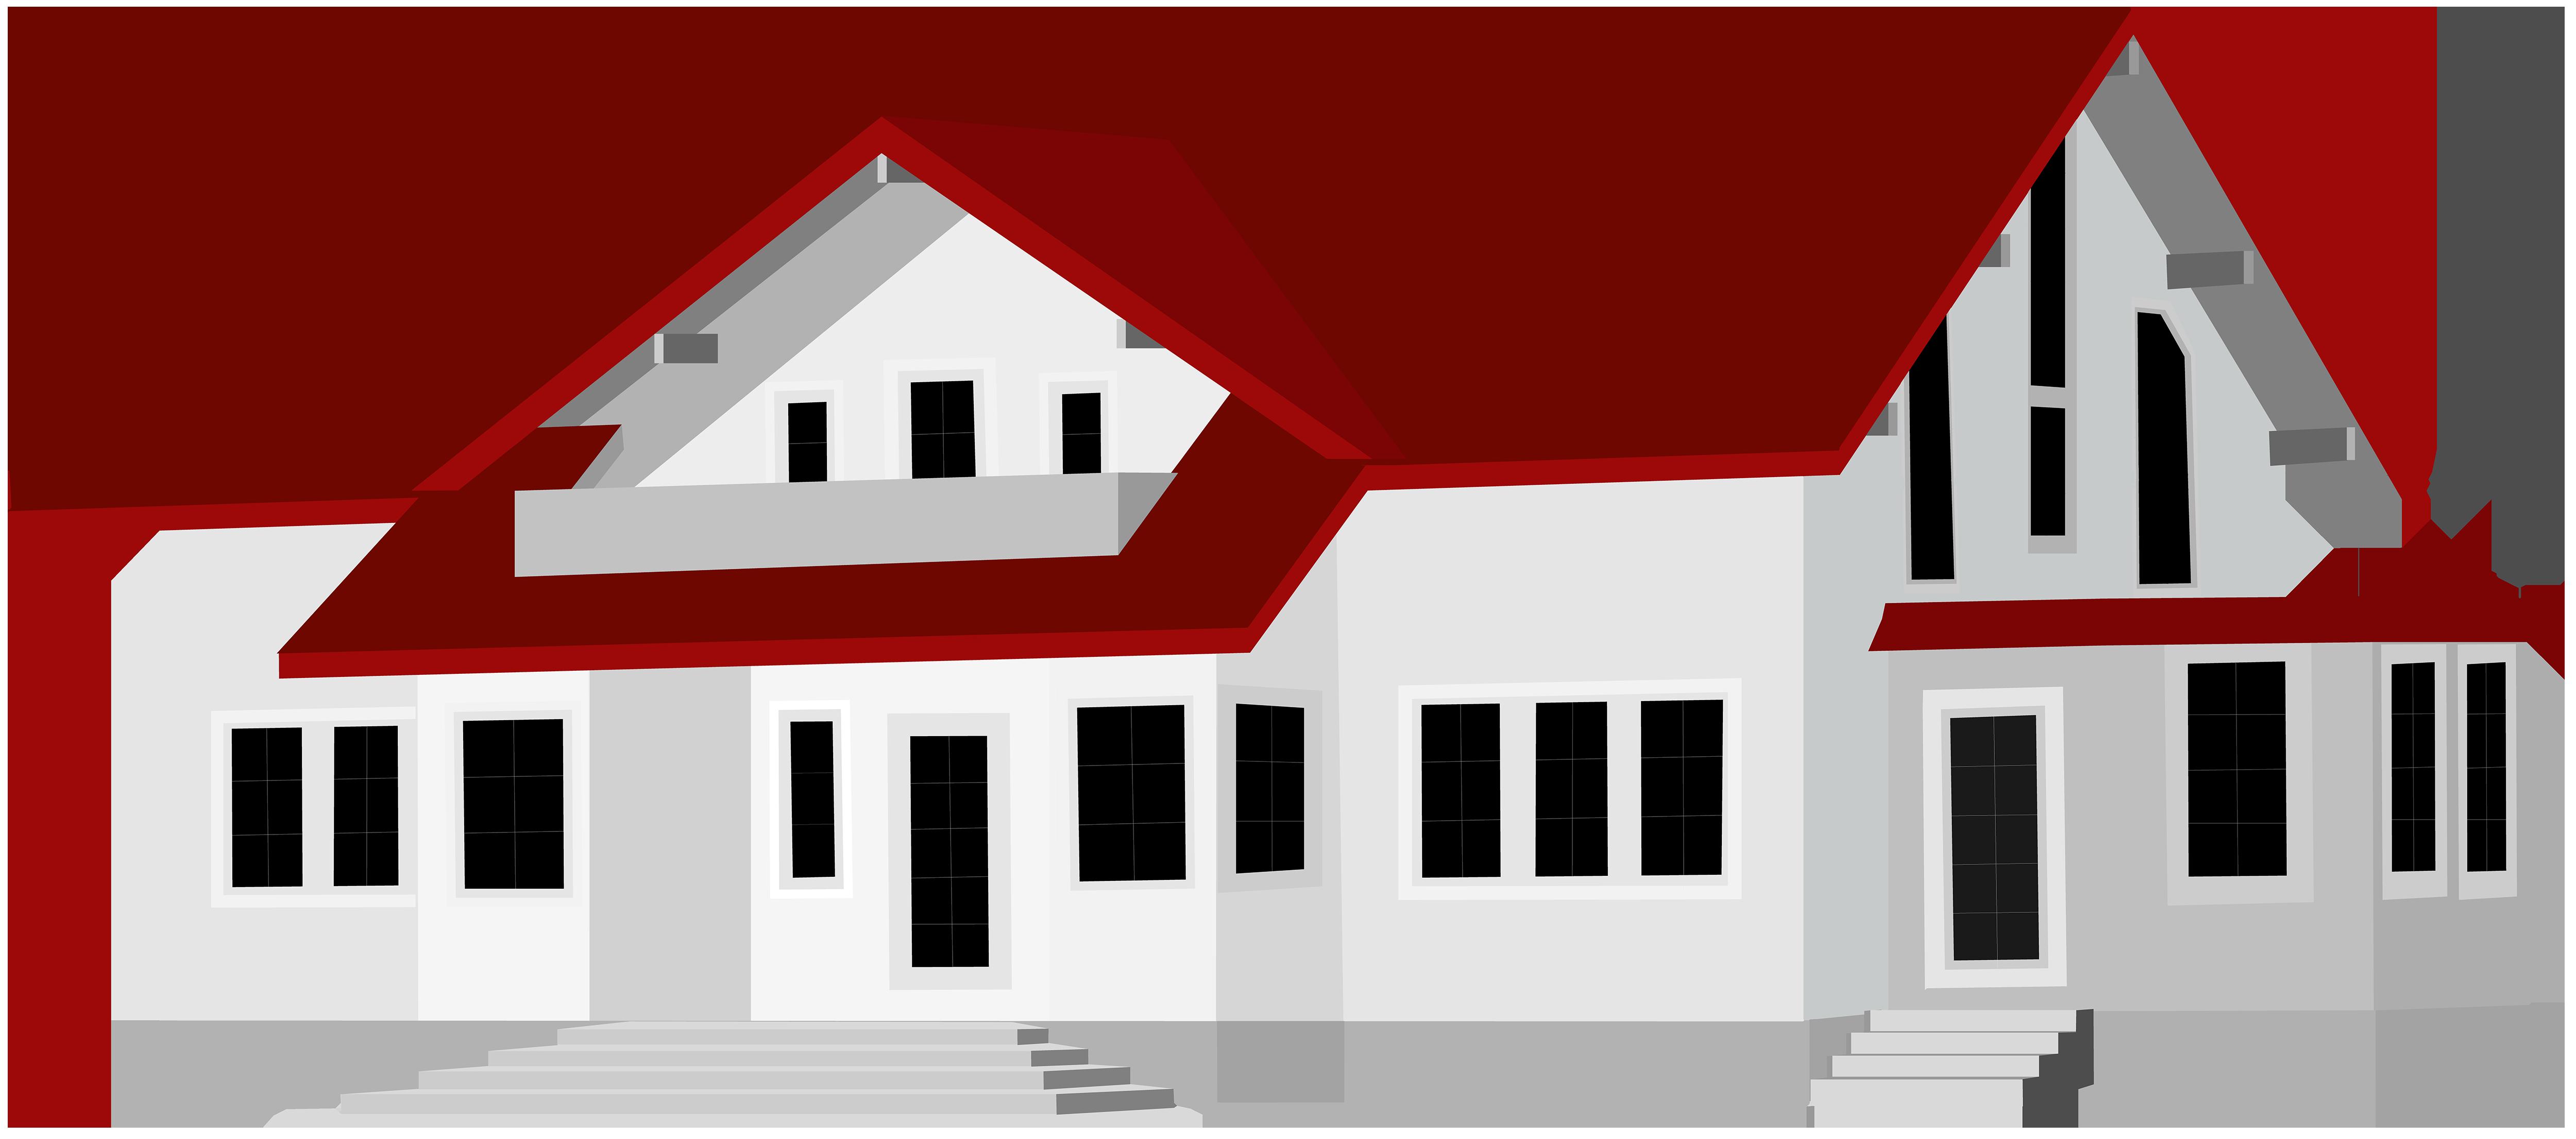 Large clipart images vector transparent download Large House PNG Clip Art - Best WEB Clipart vector transparent download